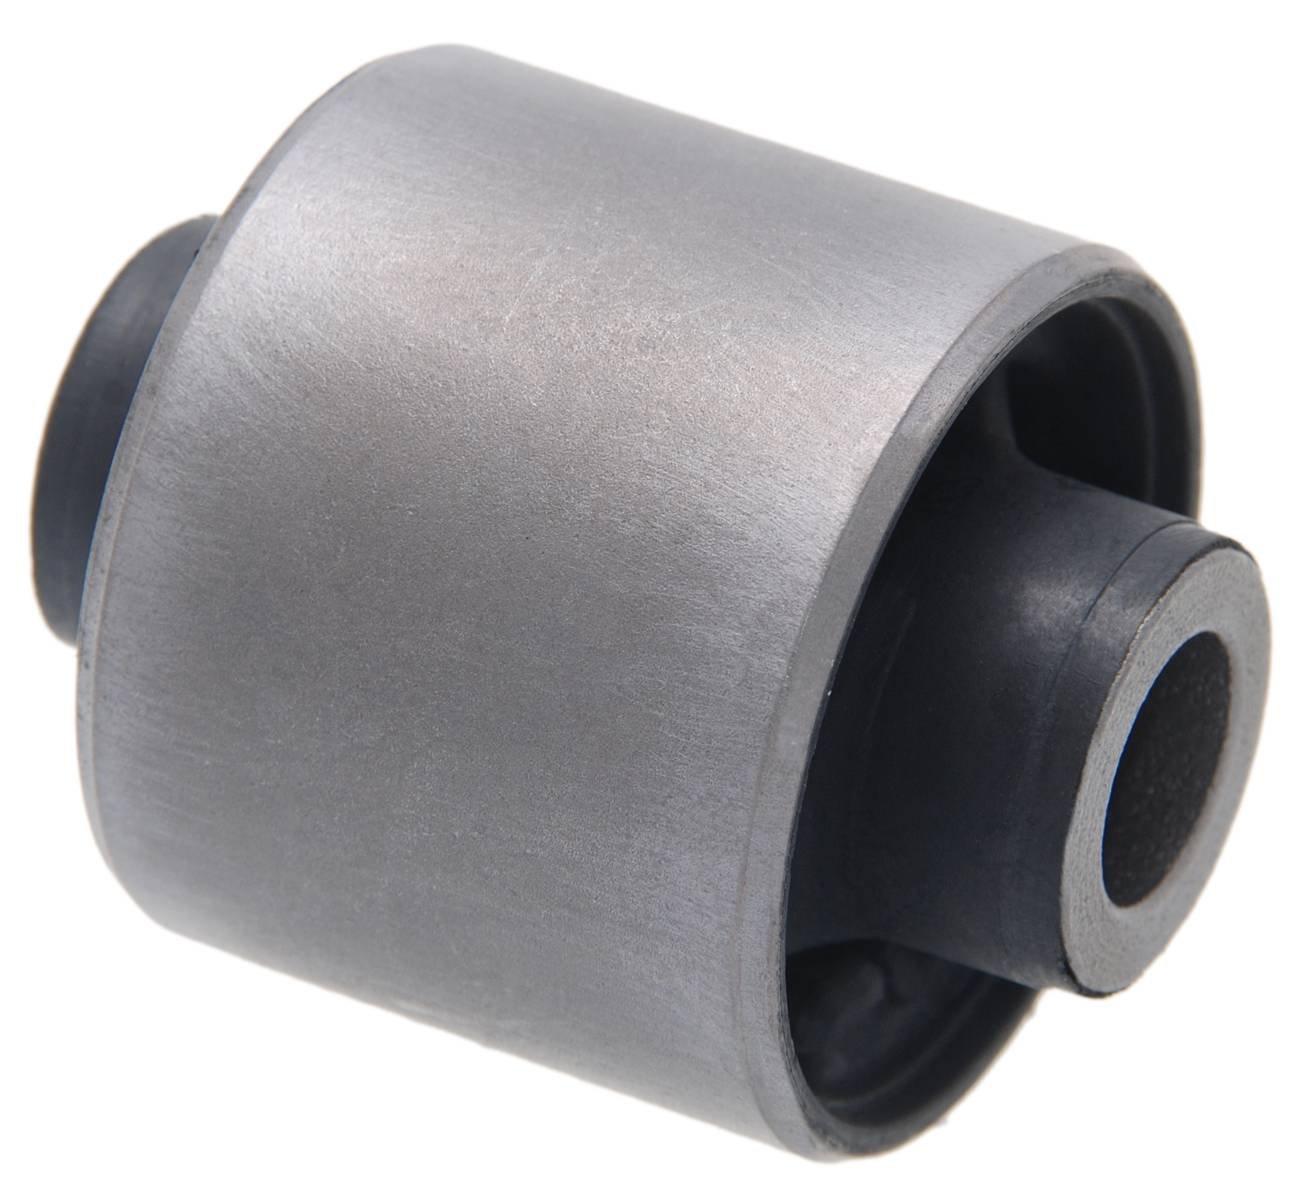 Nissan - Arm Bushing Differential Mount - Oem: 54720-0W002